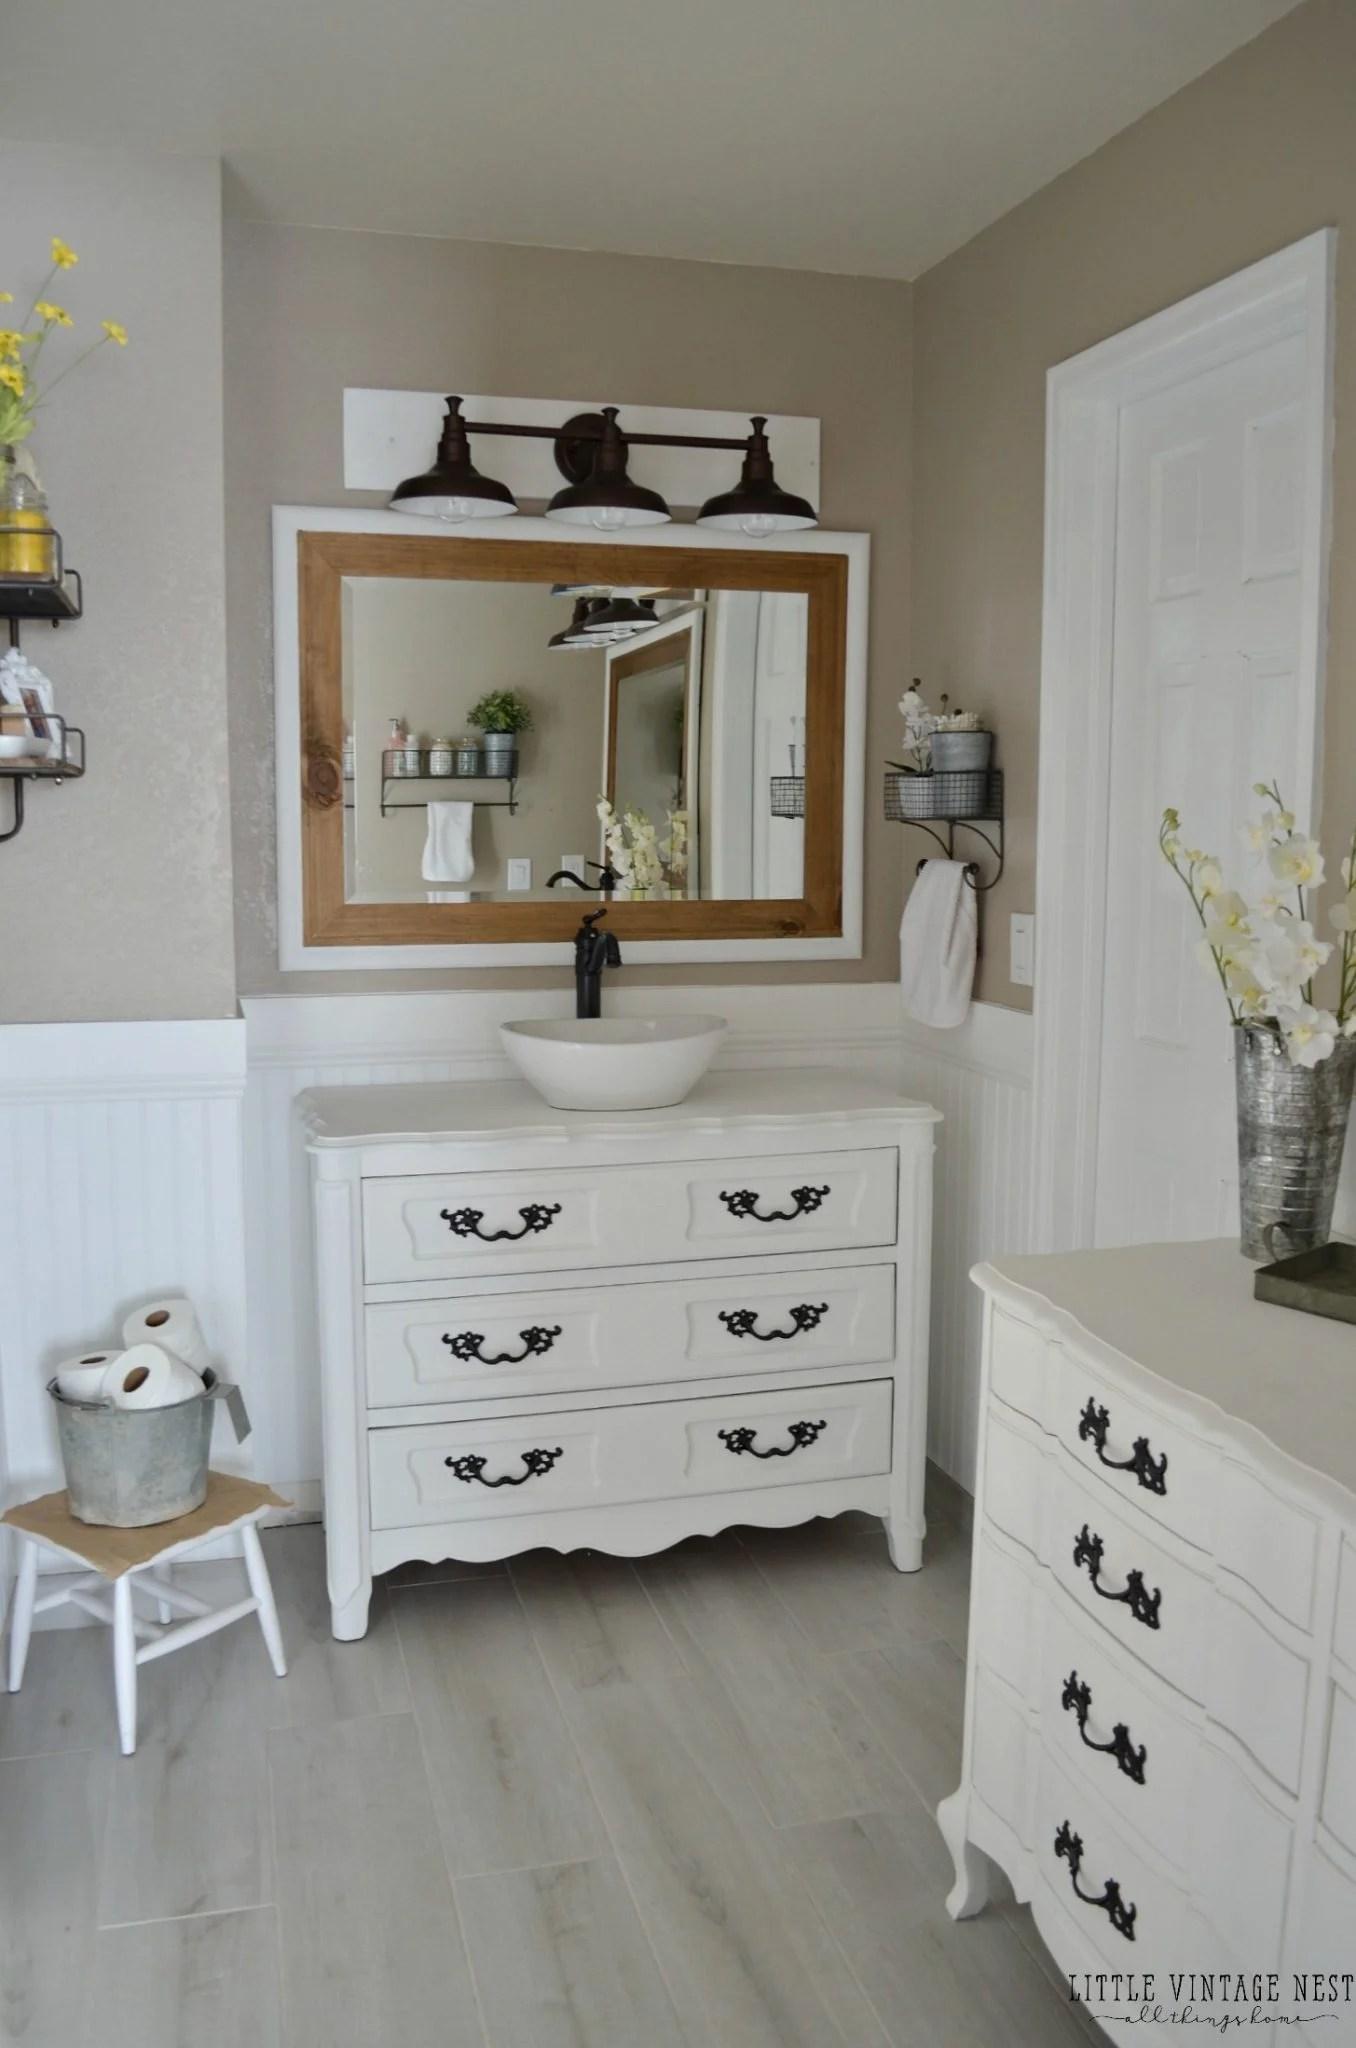 Rustic Bathroom Decor Ideas | The Country Chic Cottage on Rustic Farmhouse Bathroom  id=17418